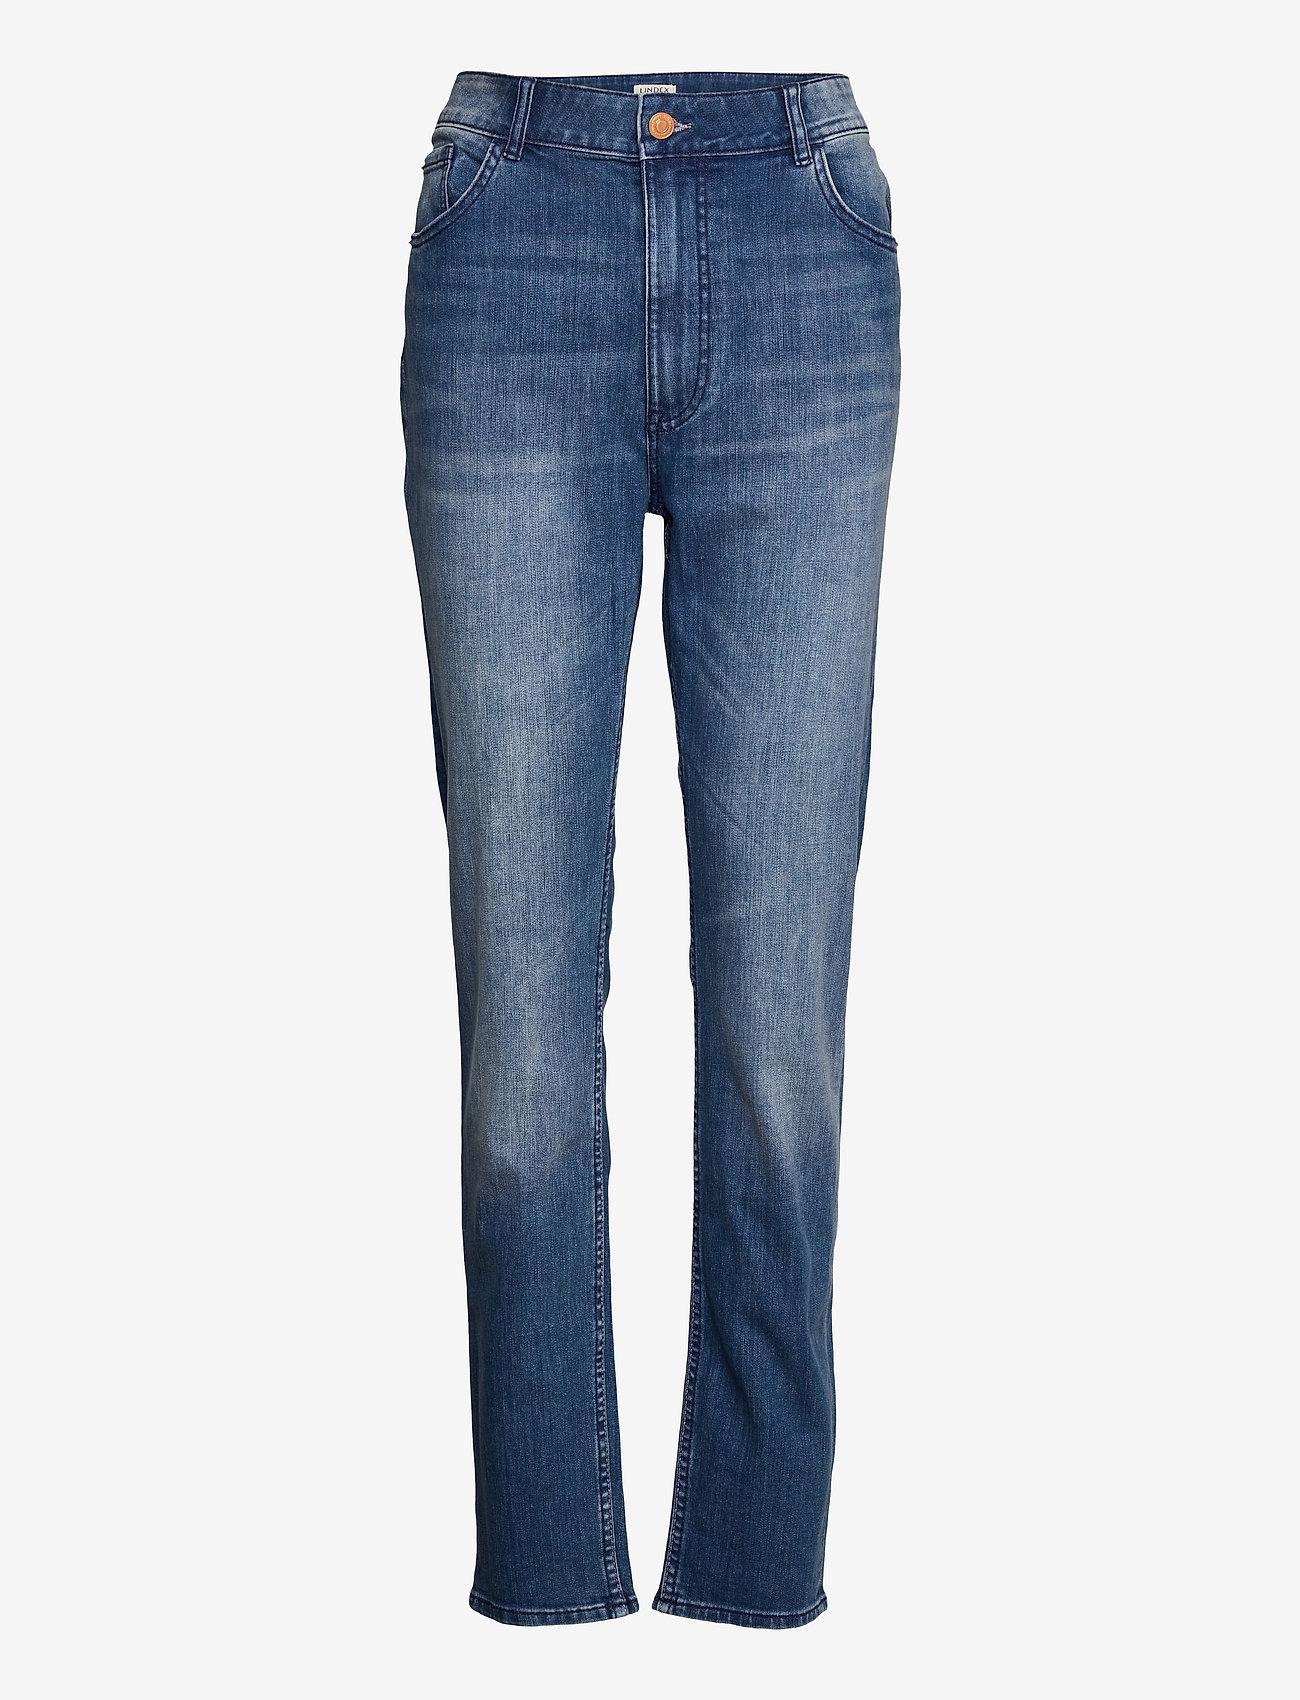 Lindex - Denim trousers Vera mid blue - slim jeans - blue - 0